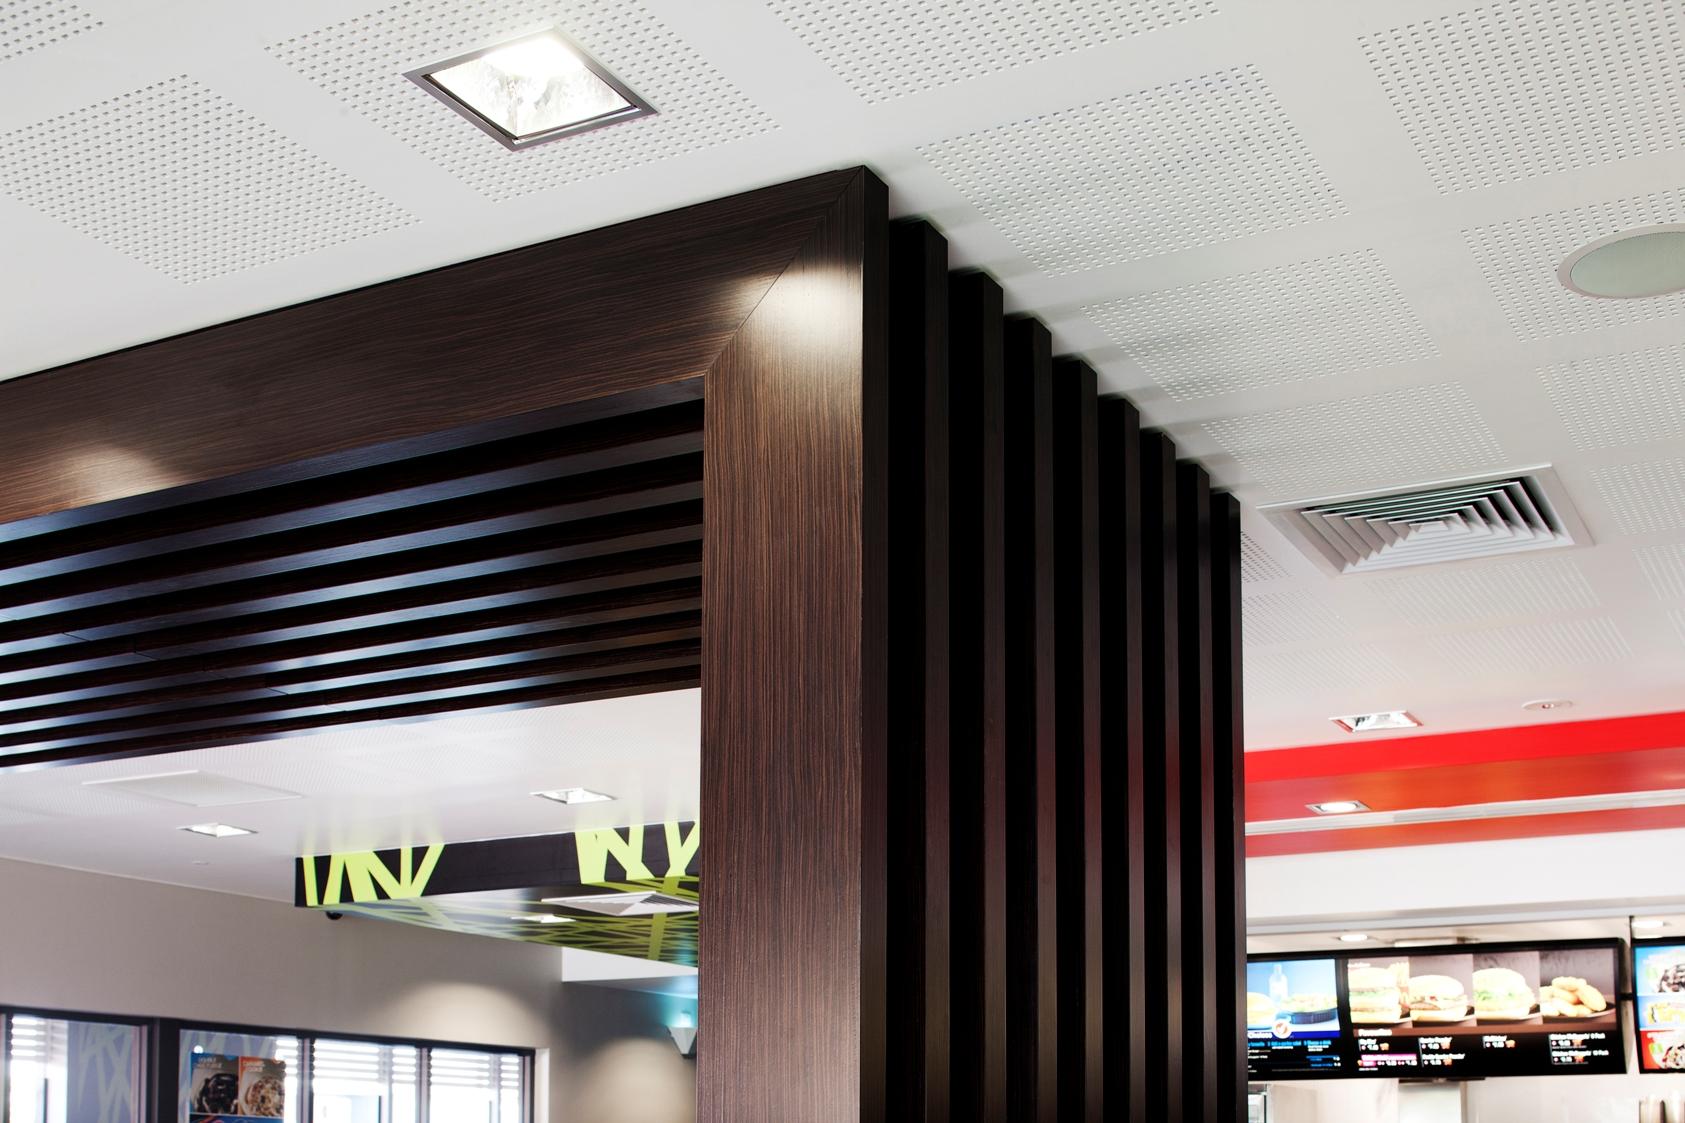 McDonalds20111027_1611small.jpg